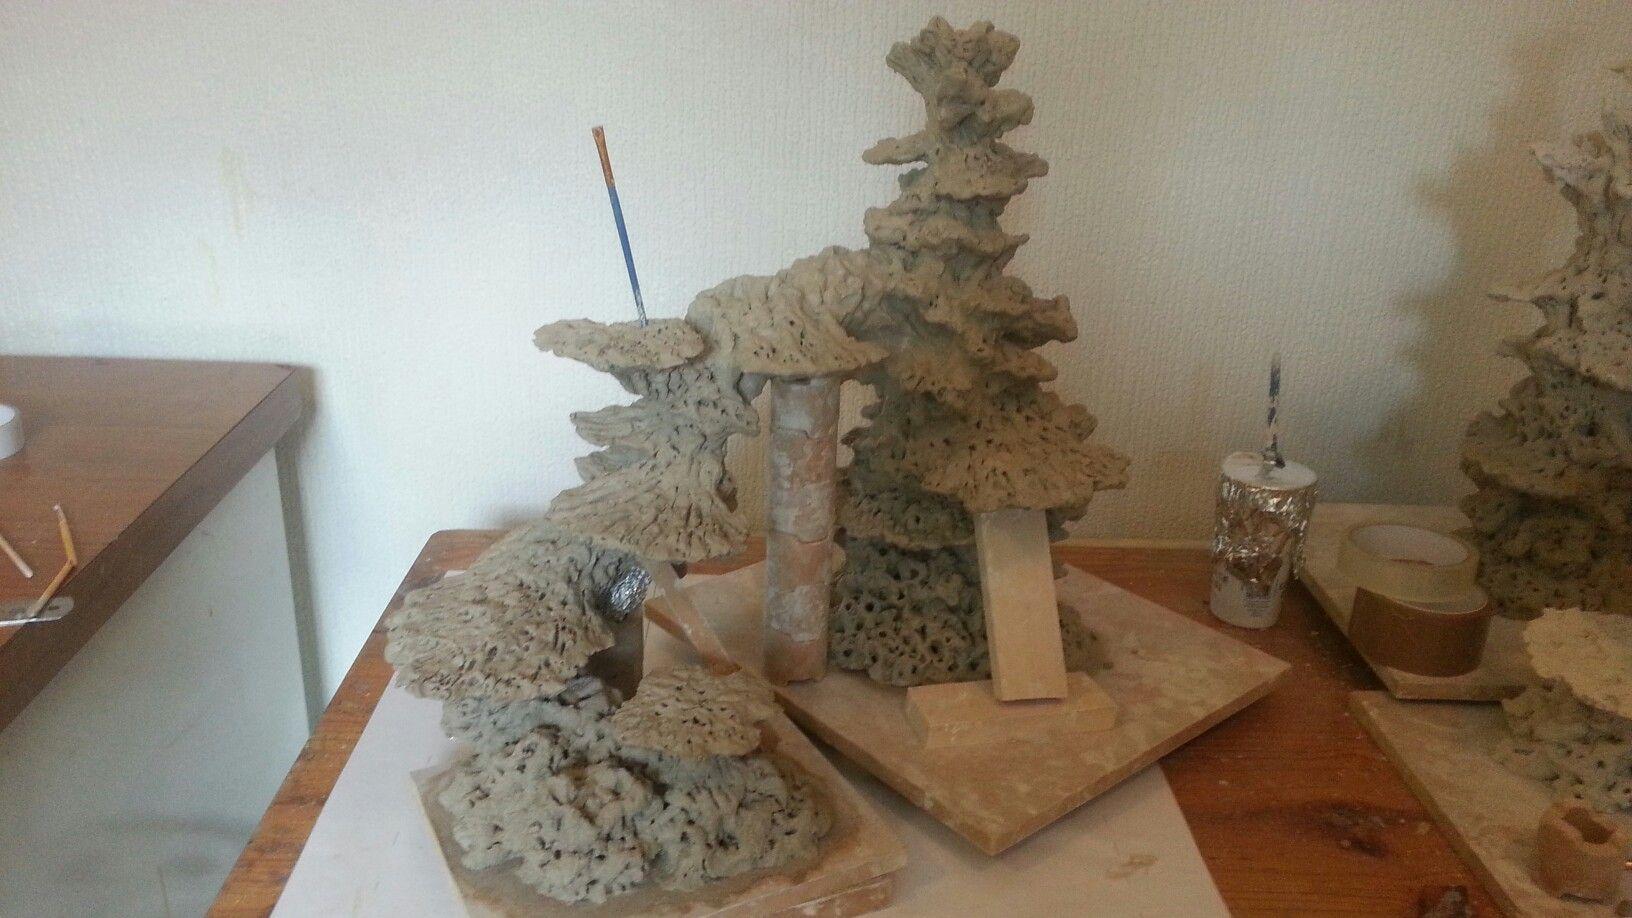 Custom Made Ceramic Rock Aquascape Www.aquascape Sculptures.co.uk